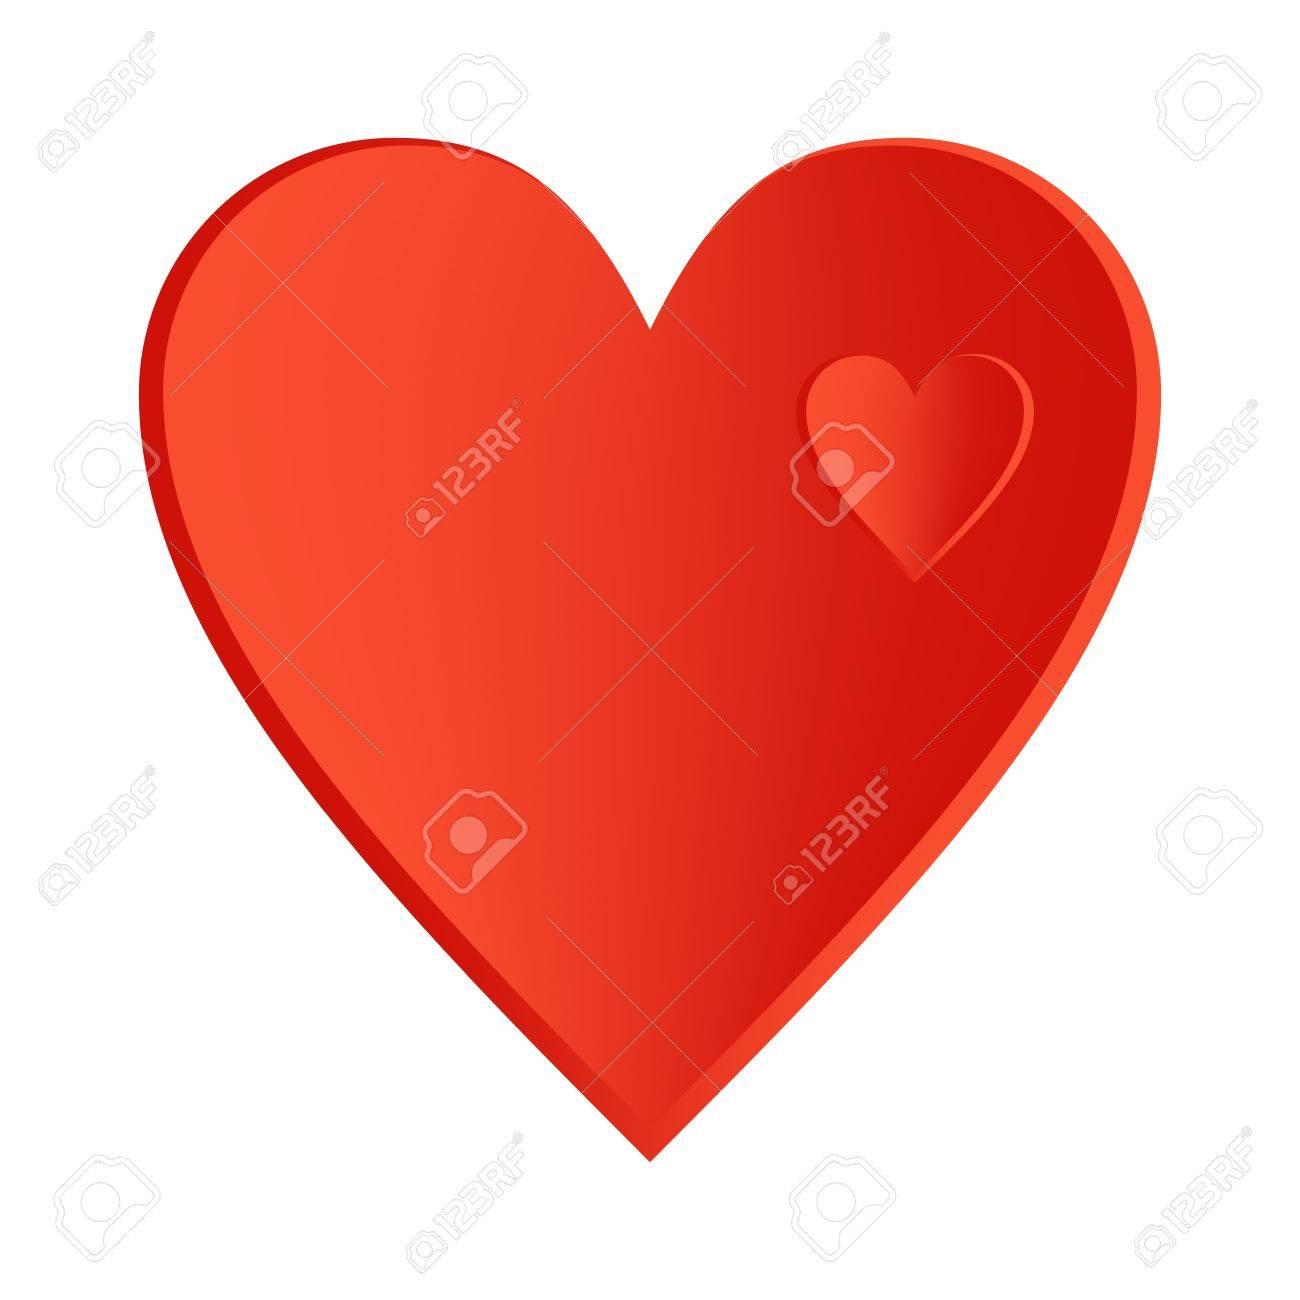 Big Heart Image